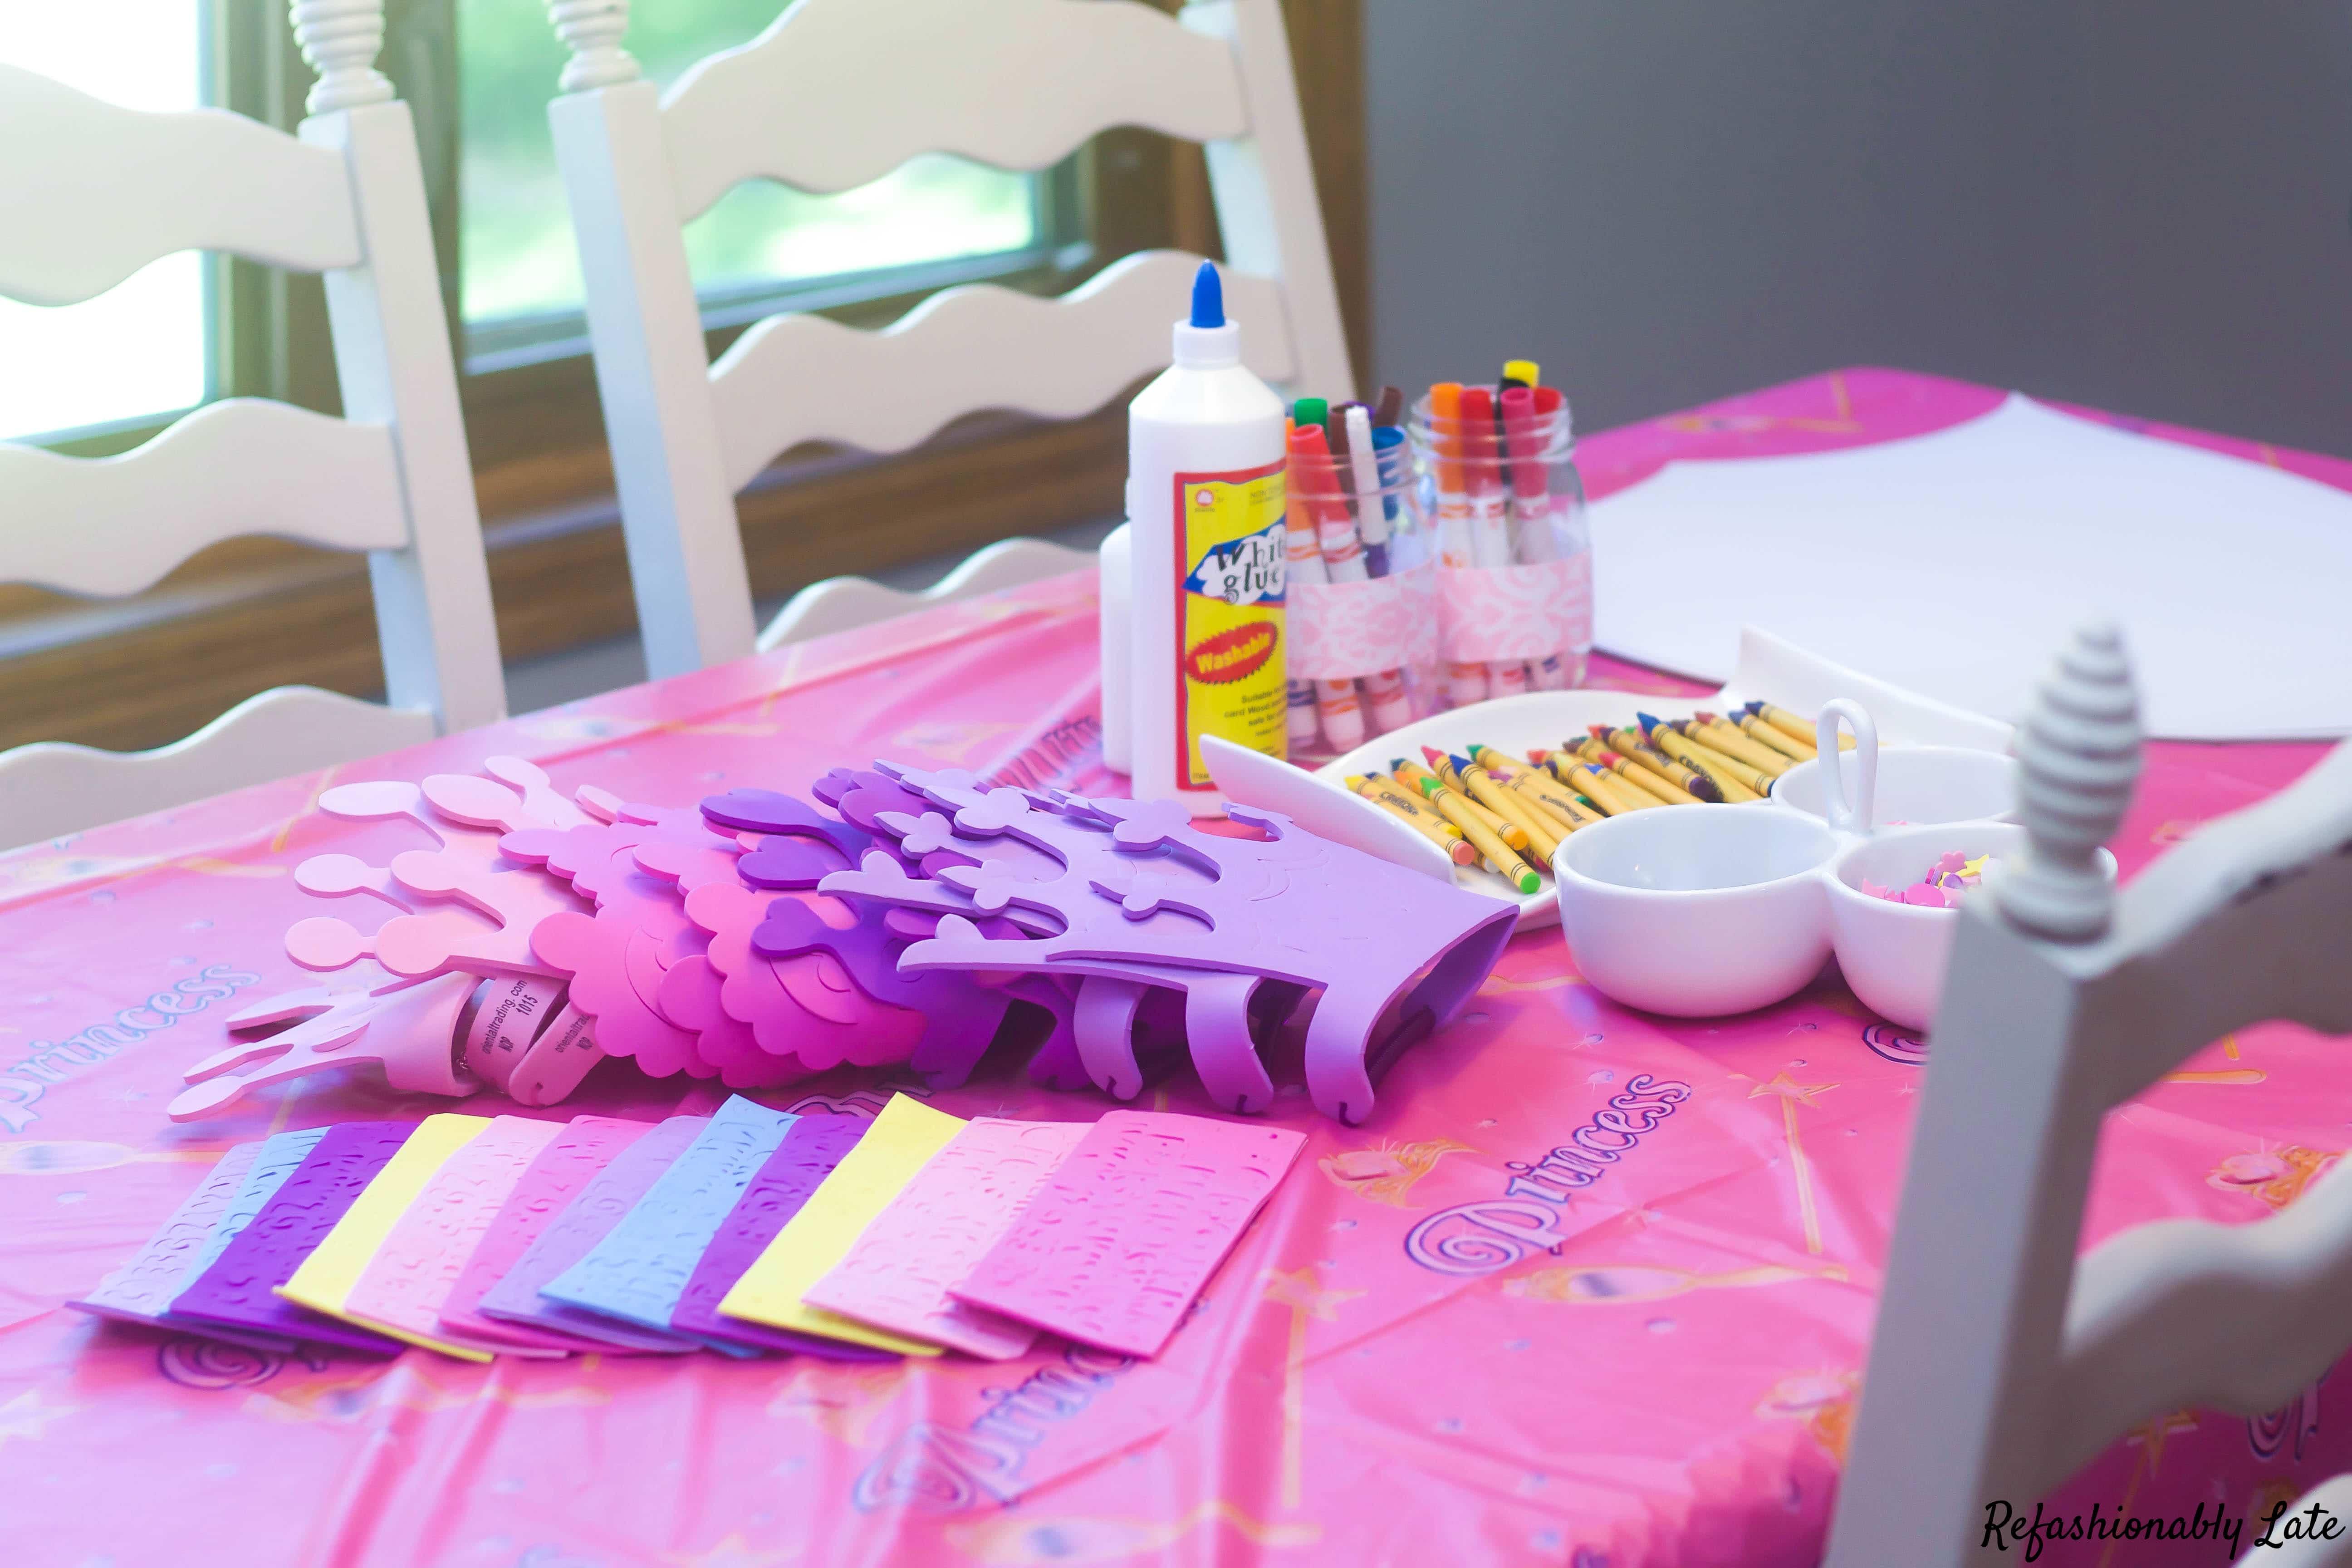 Lucy's Birthday Party Fit for a Princess - www.refashionablylate.com